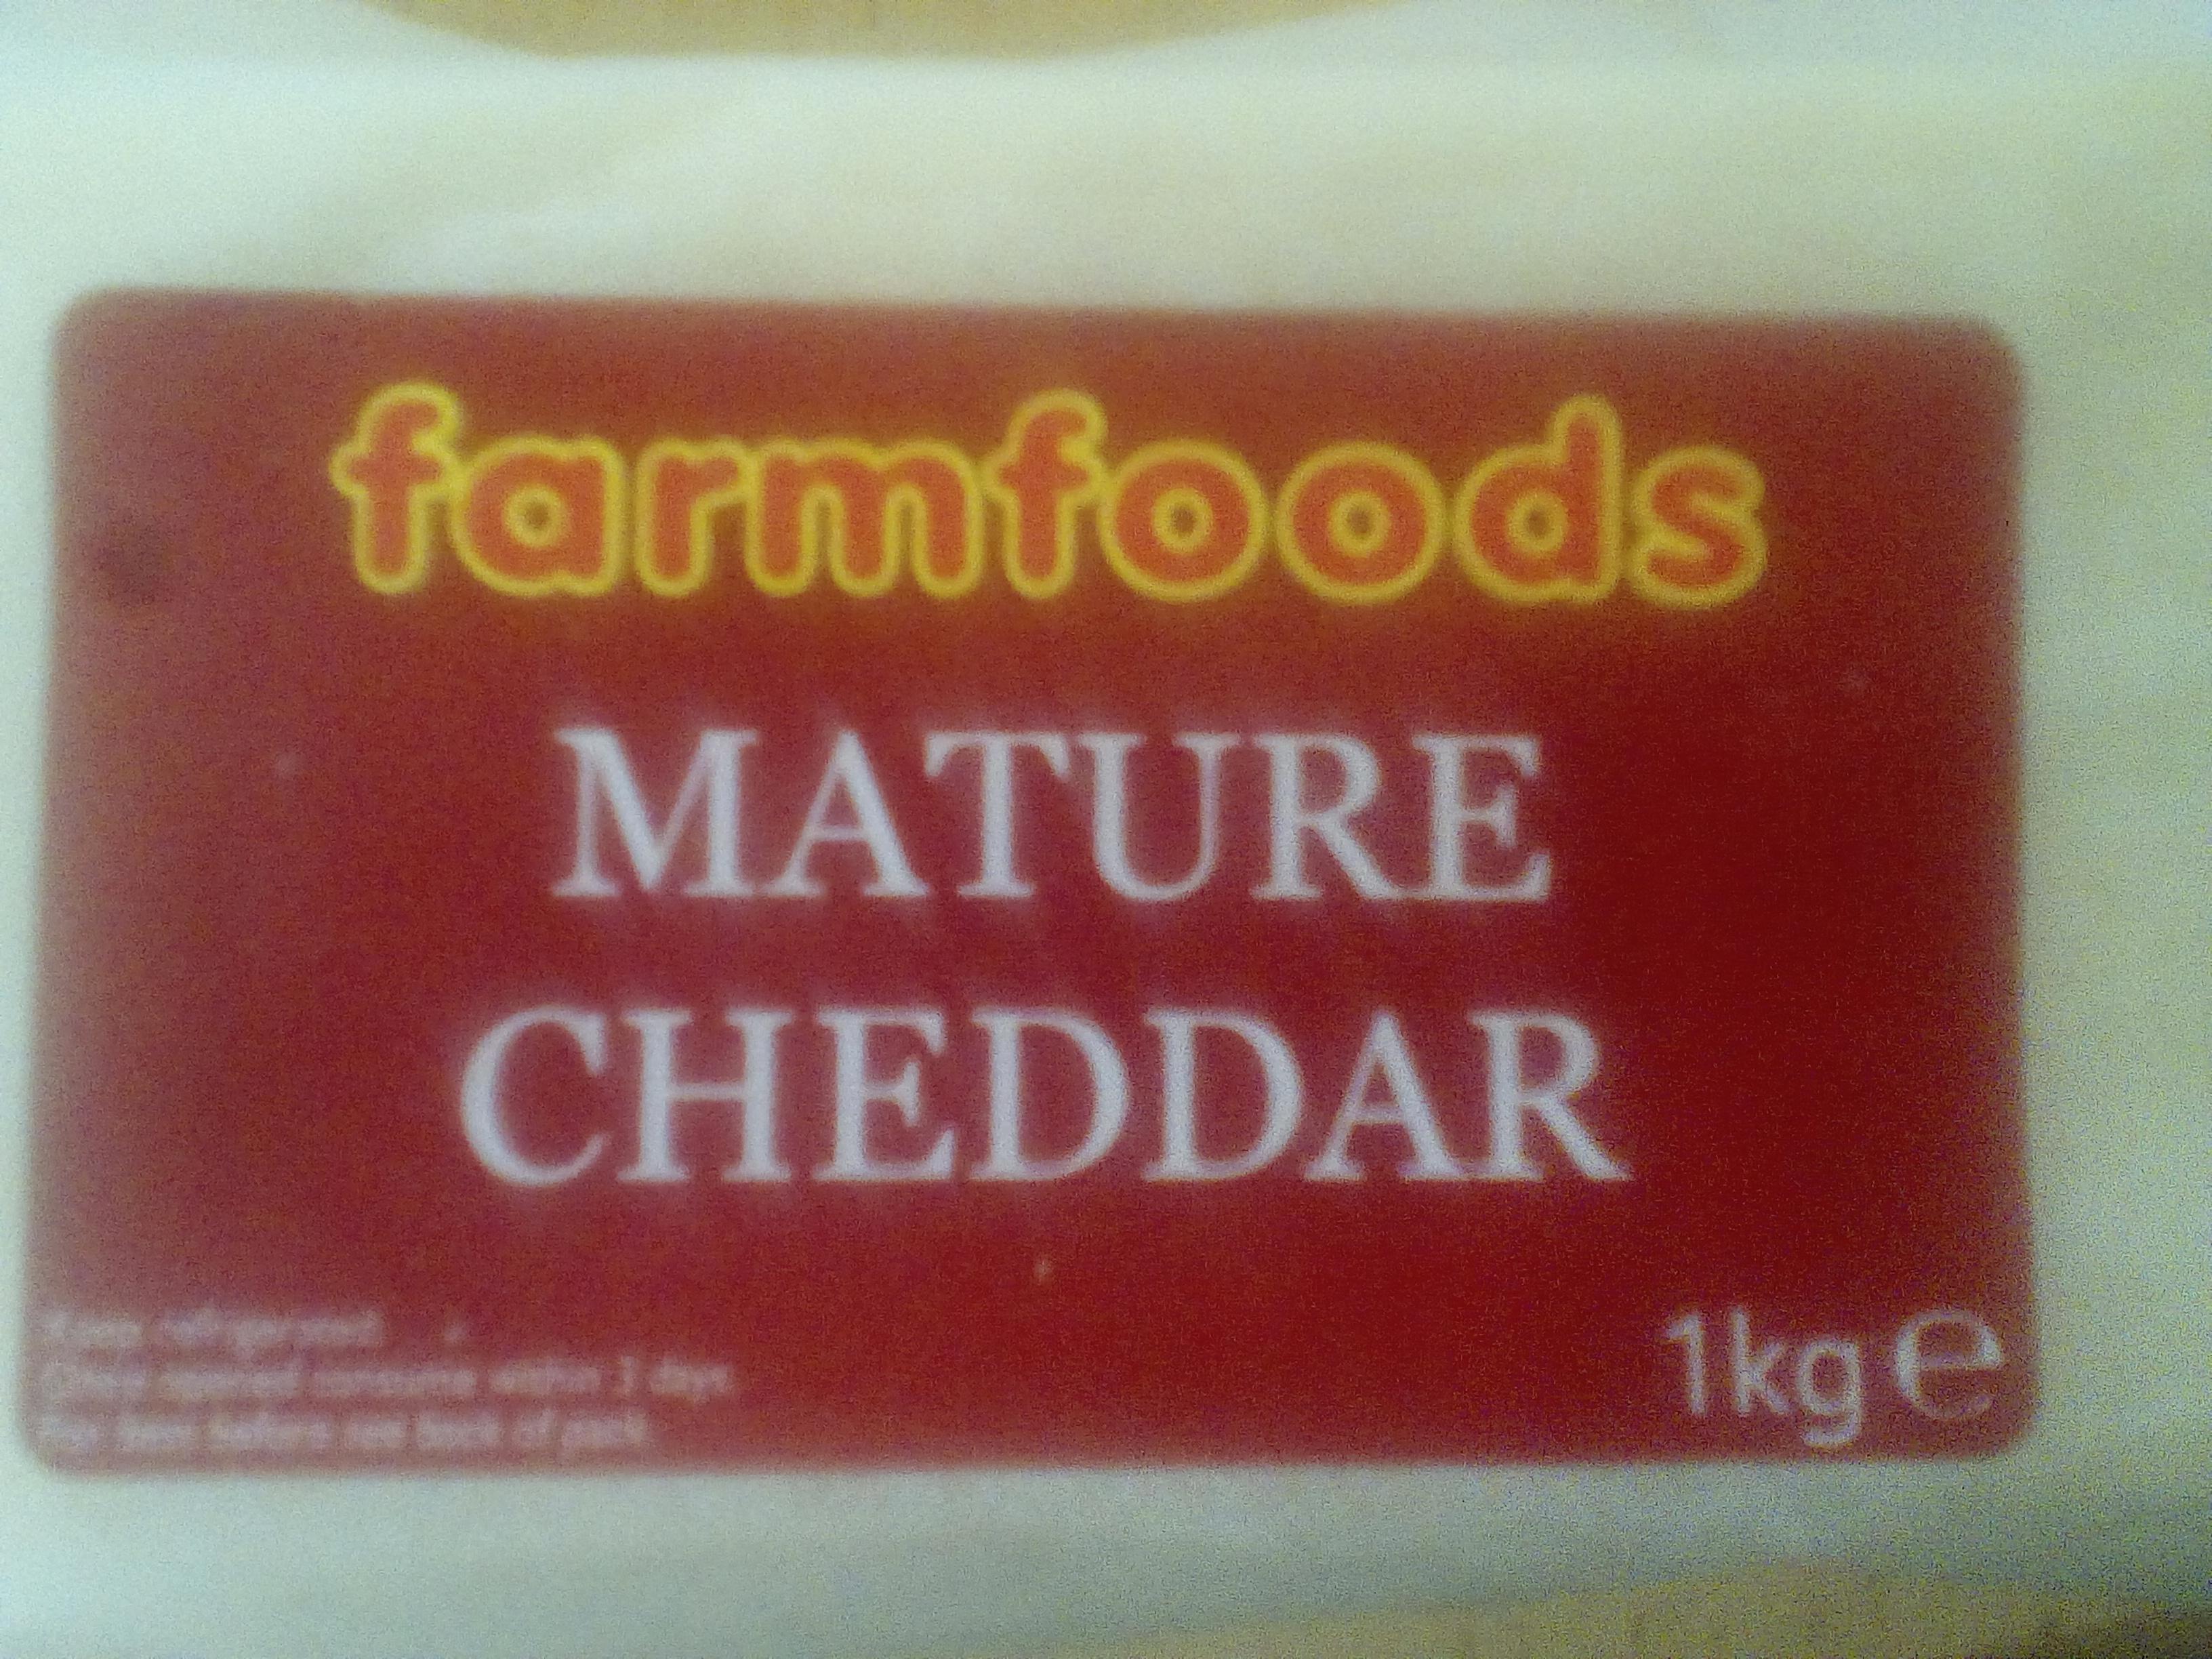 Mature Cheddar 1kg Farmfoods - £4.50